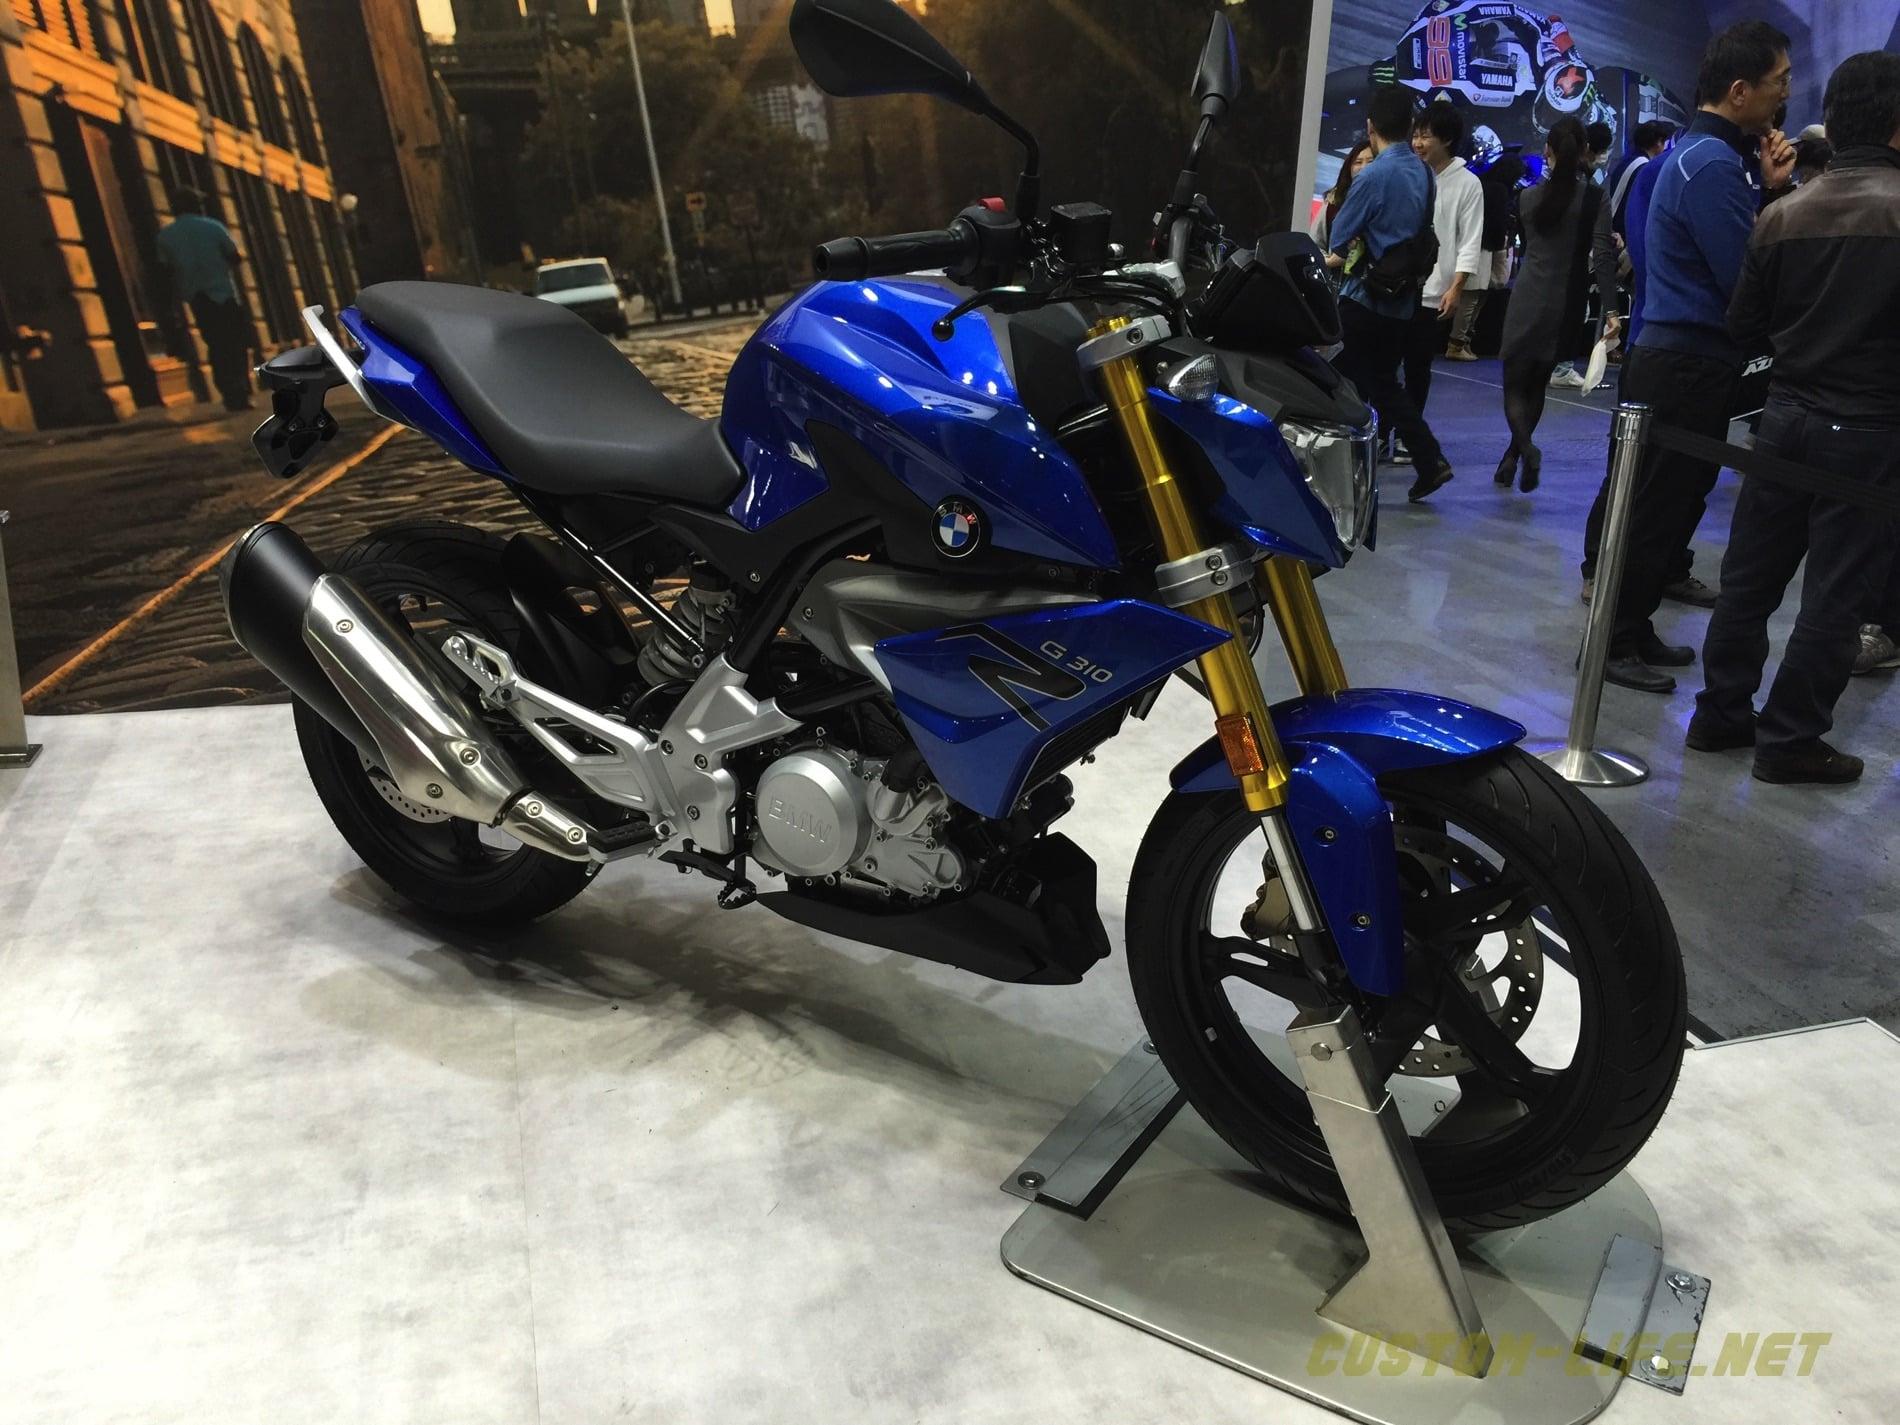 MCS2016 DucatiKTMBMWBooth 07